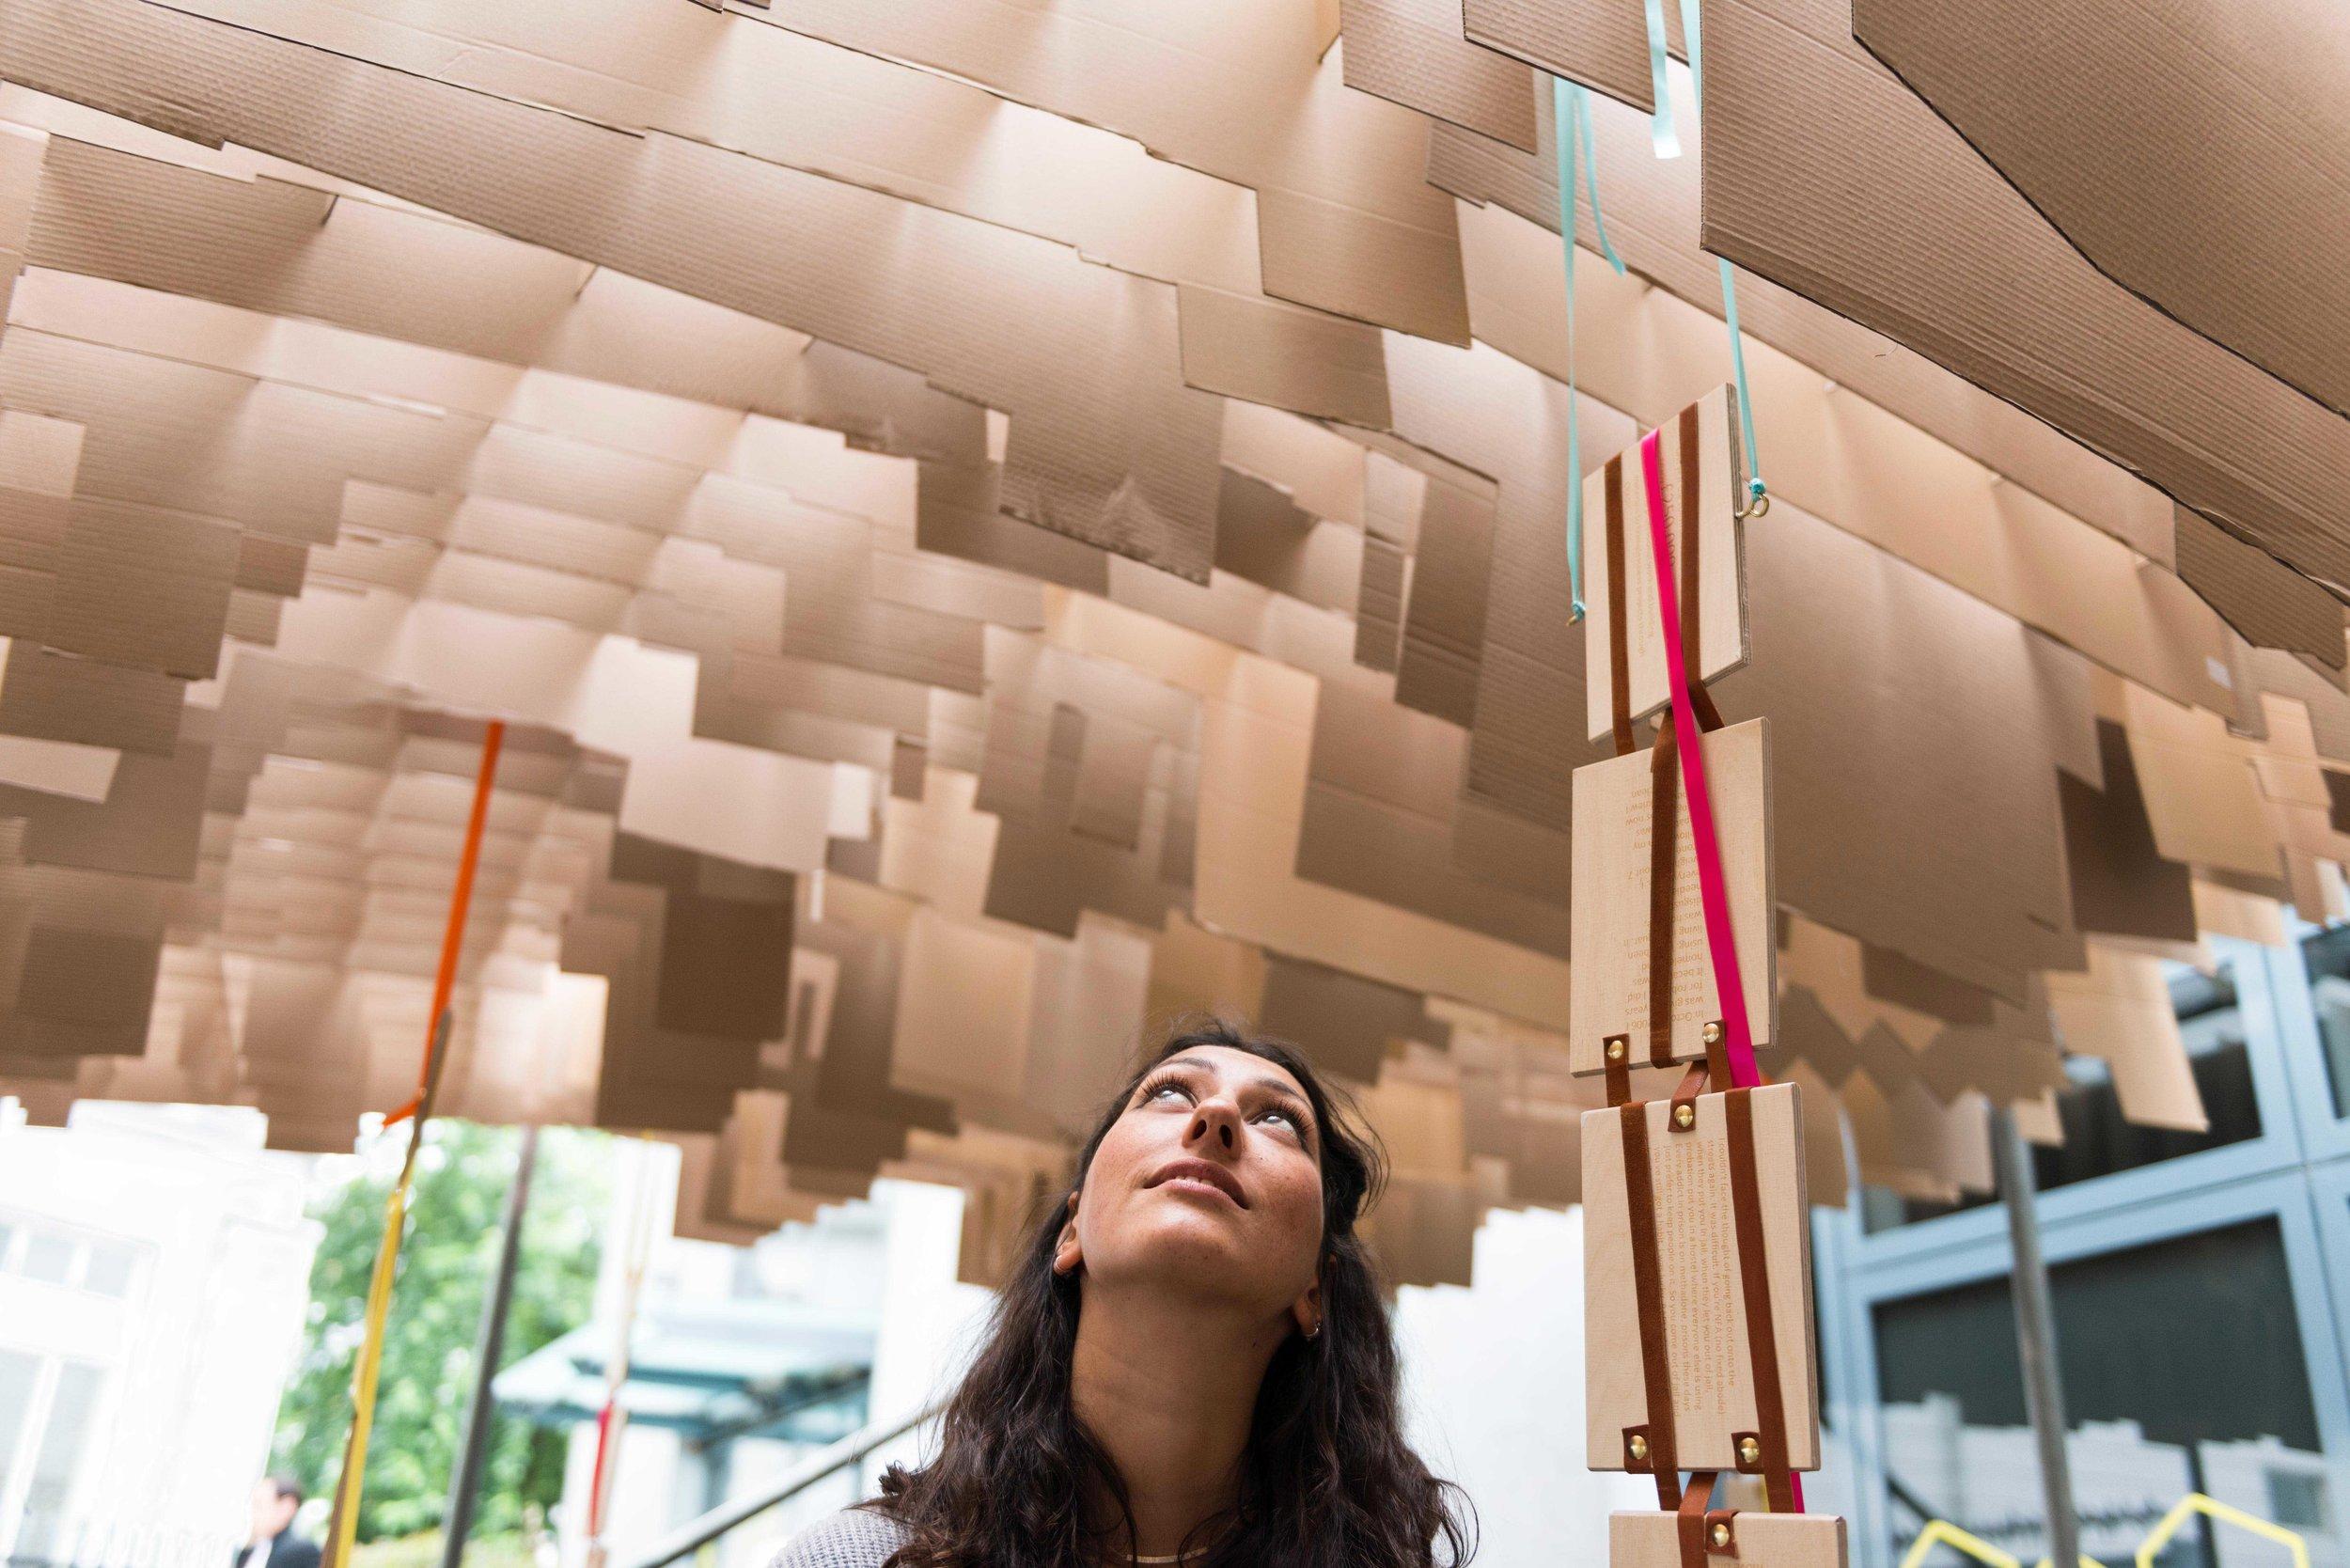 Levitt Bernstein_LFA City of Stories_The installation_Copyright_Marsha Dunstan.jpg